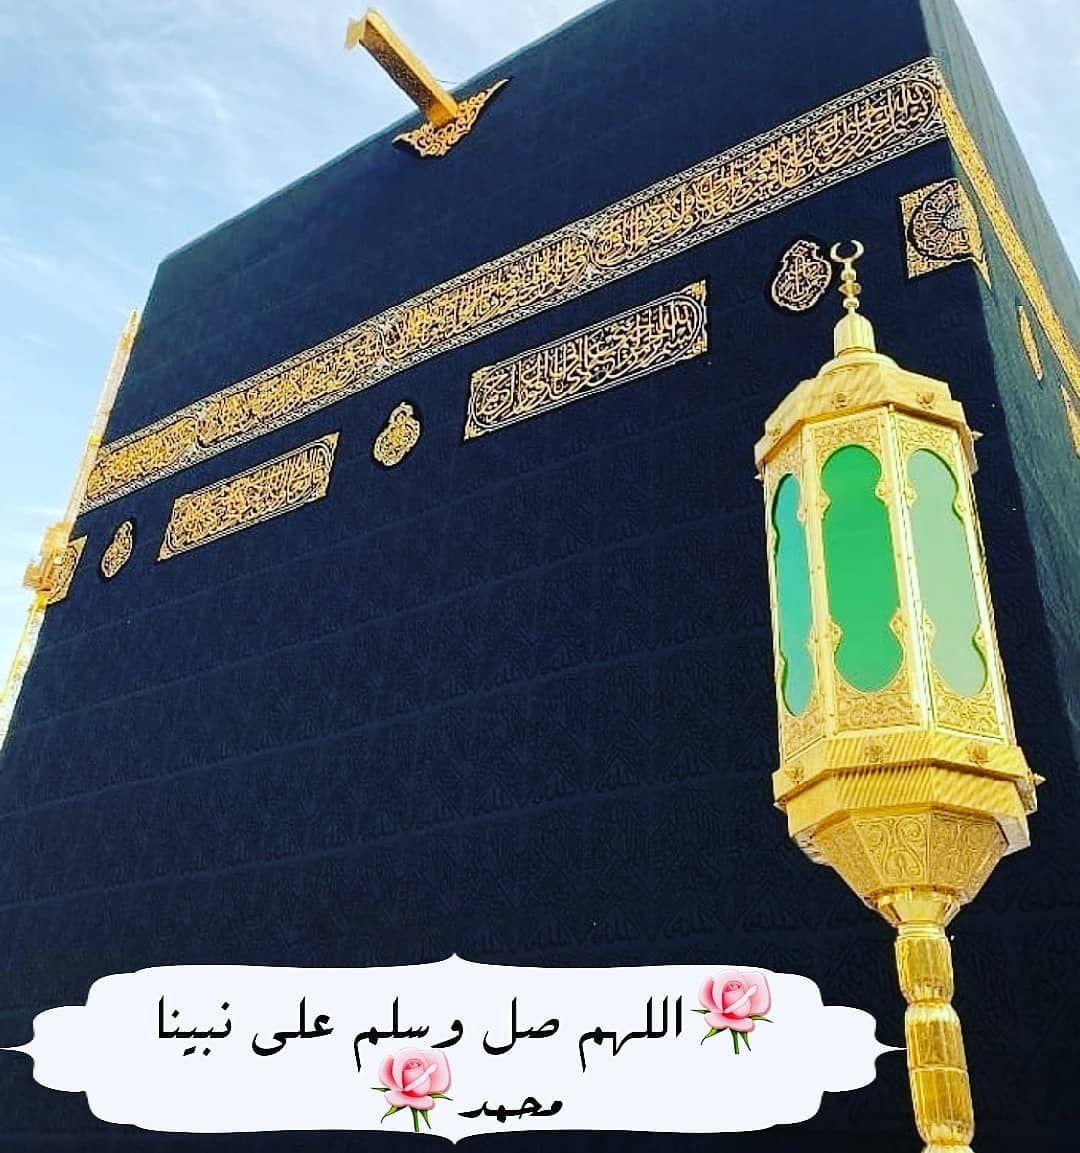 Instagram Post By اللهم صل وسلم على نبينا محمد Mar 20 2020 At 8 49pm Utc Duaa Islam Baroda Instagram Posts